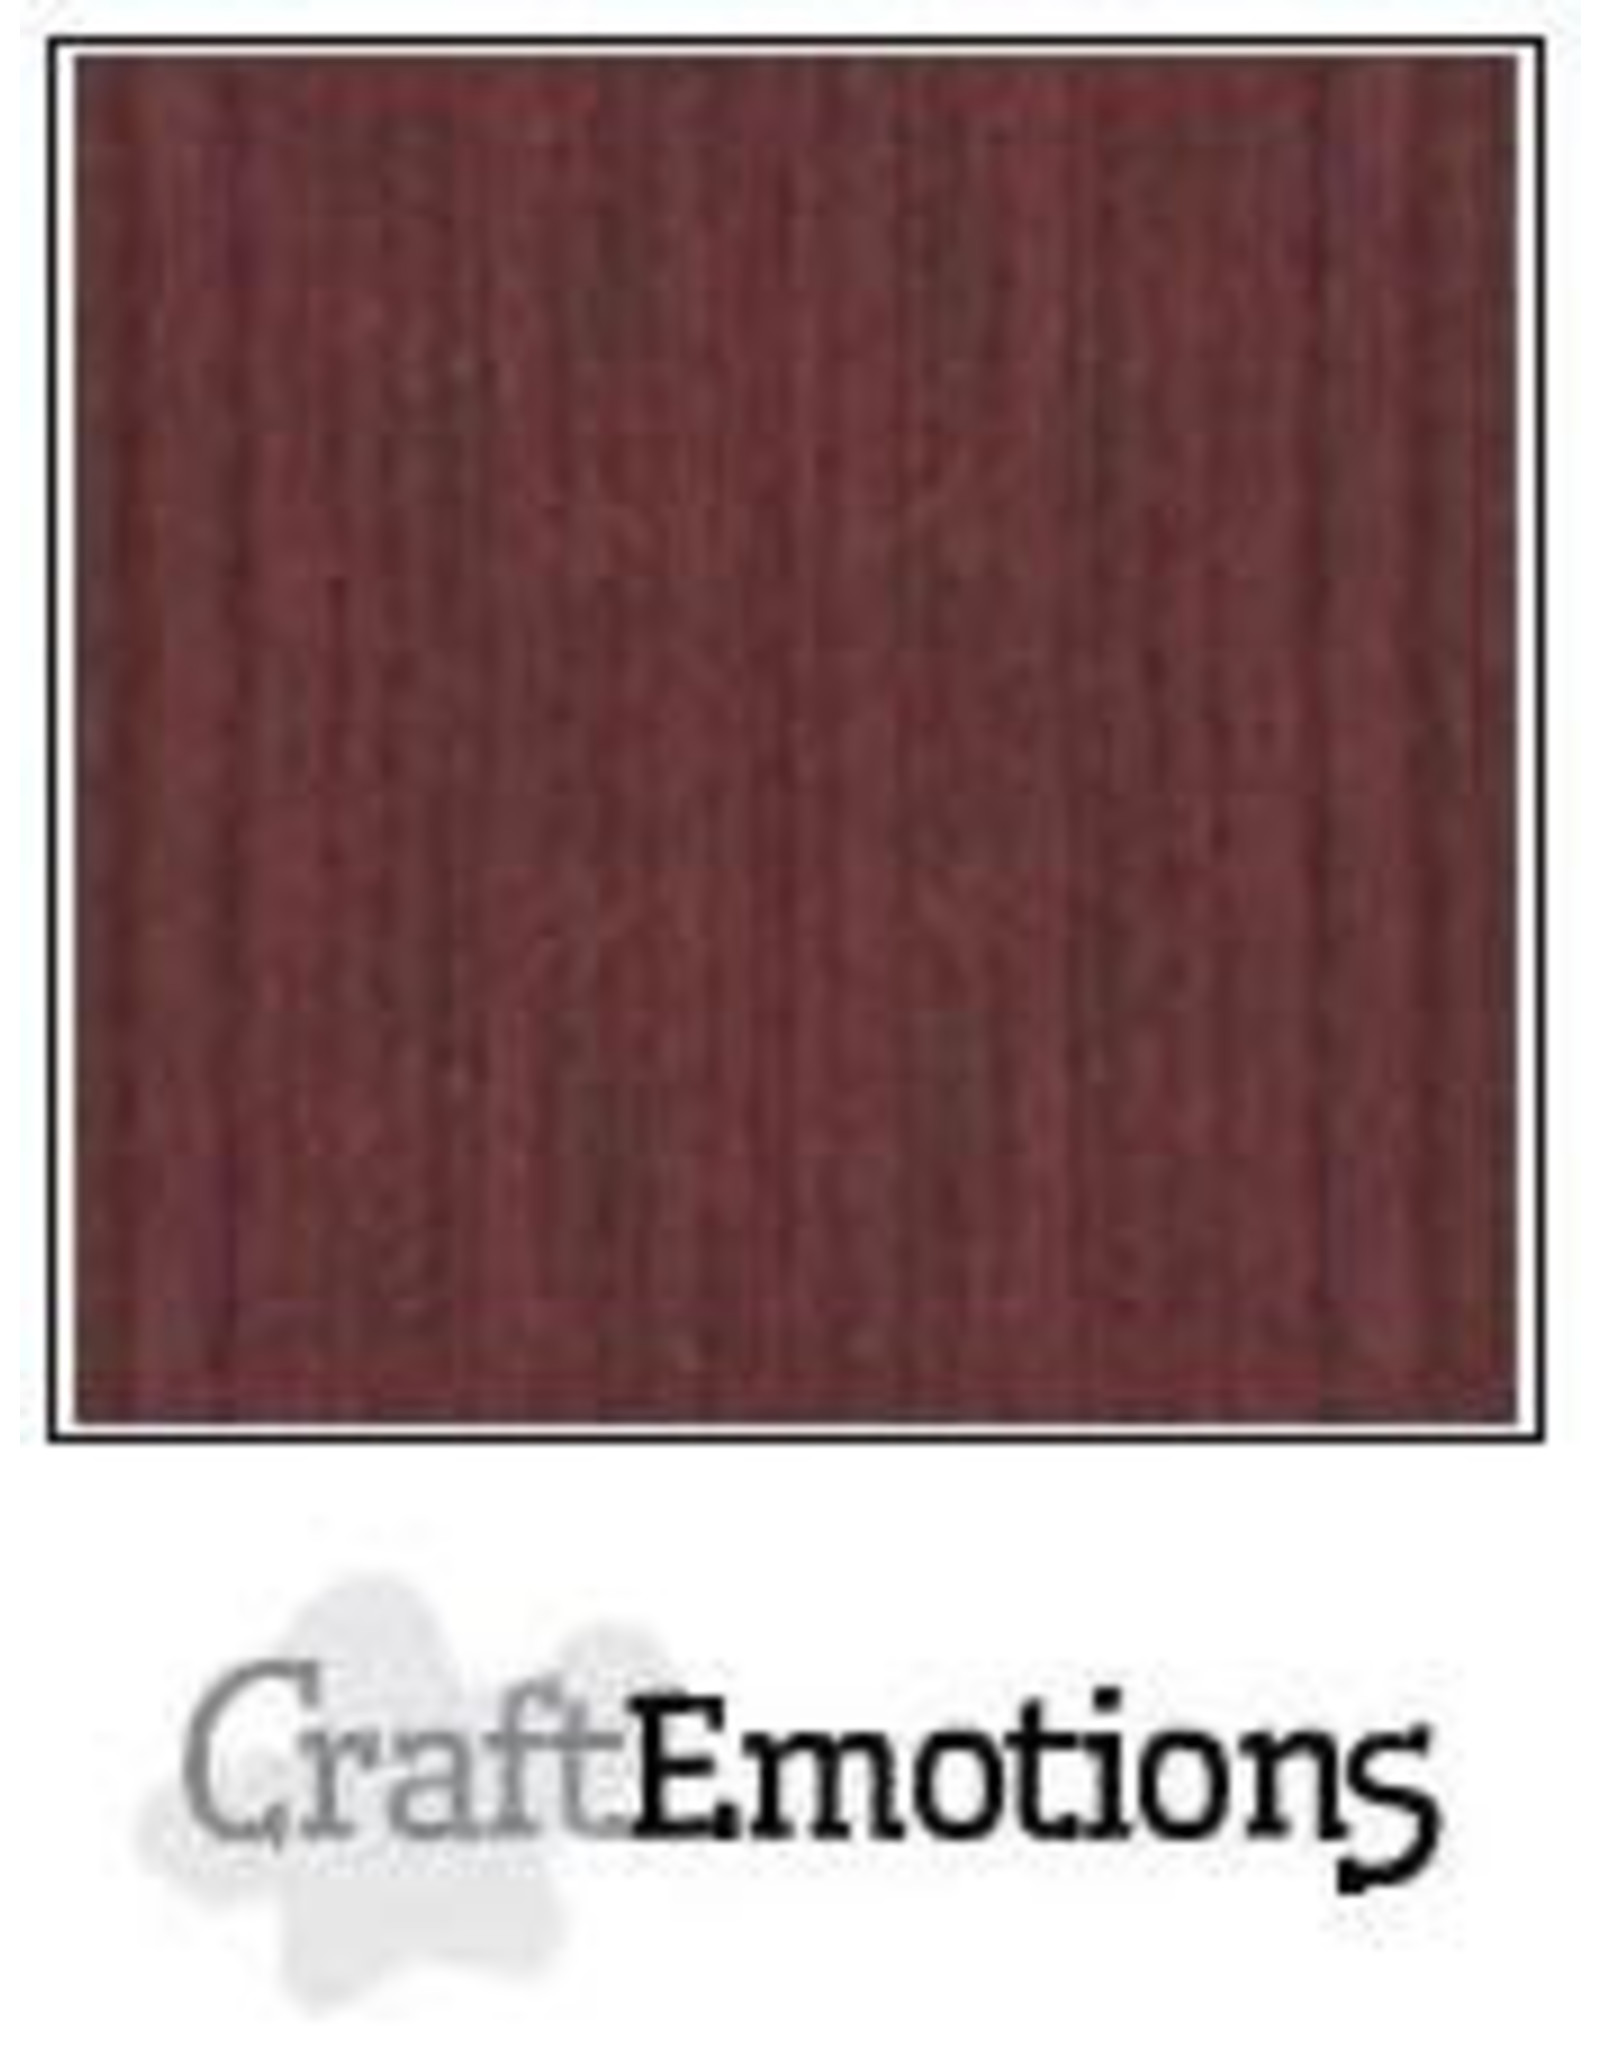 Craft Emotions CraftEmotions linnenkarton mahoniebruin 30,0x30,0cm